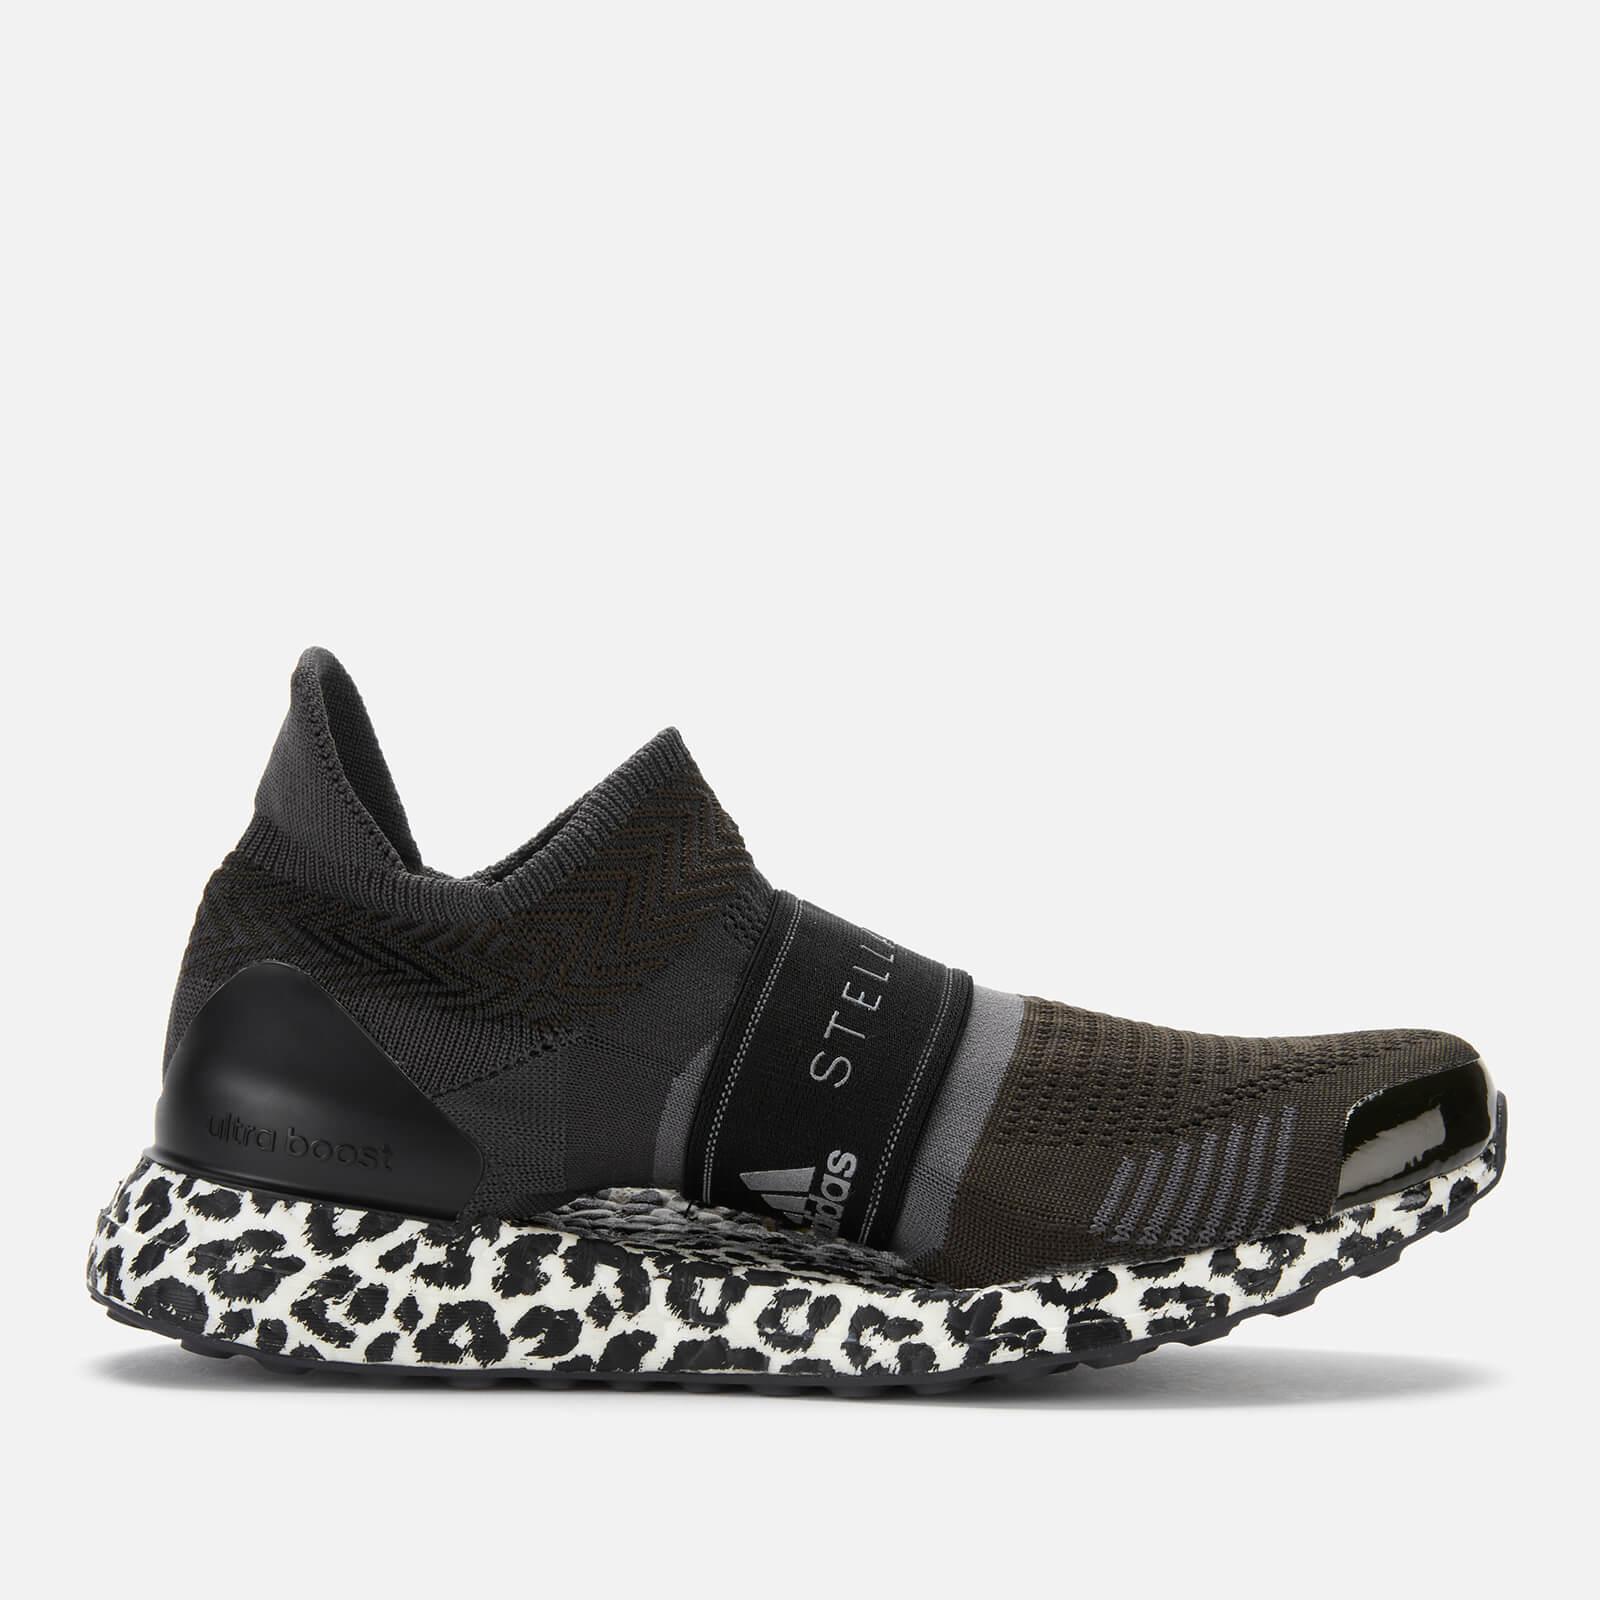 innovative design e0ecb 88477 adidas by Stella McCartney Women's Ultraboost X 3.D S Trainers - Urban Earth